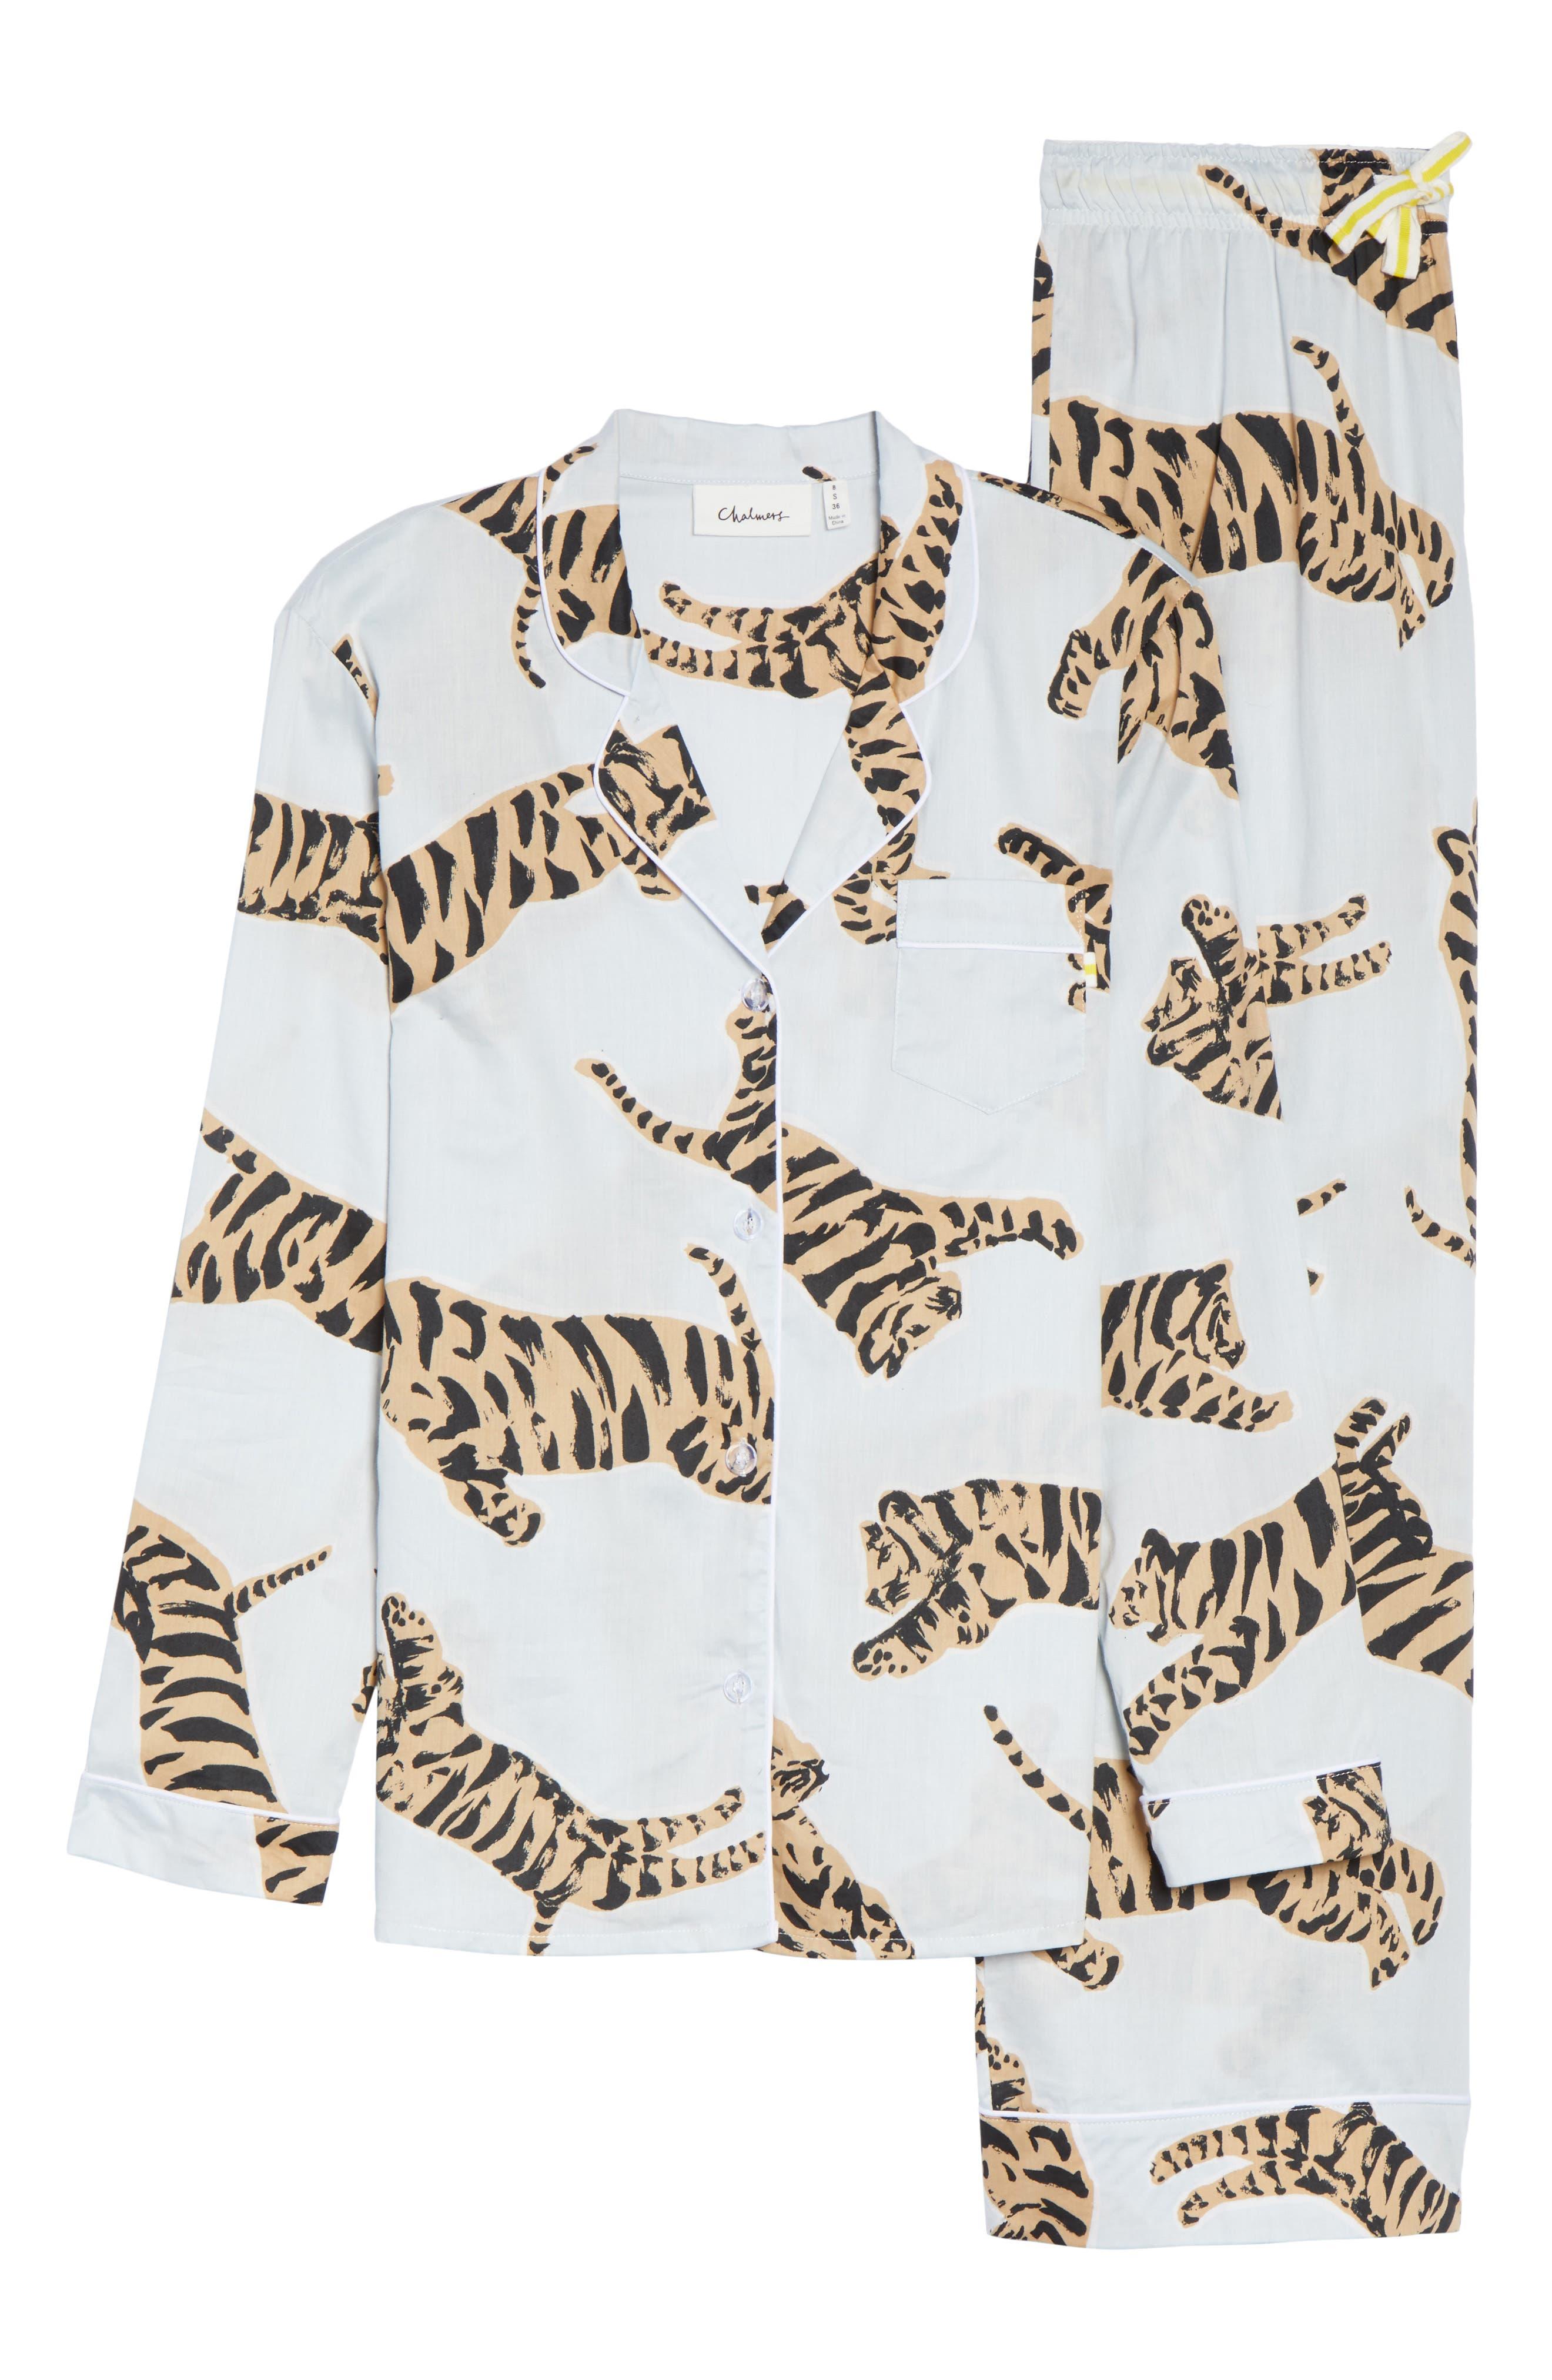 Suzie Cotton Pajamas,                             Alternate thumbnail 4, color,                             Tiger Moon Light Blue